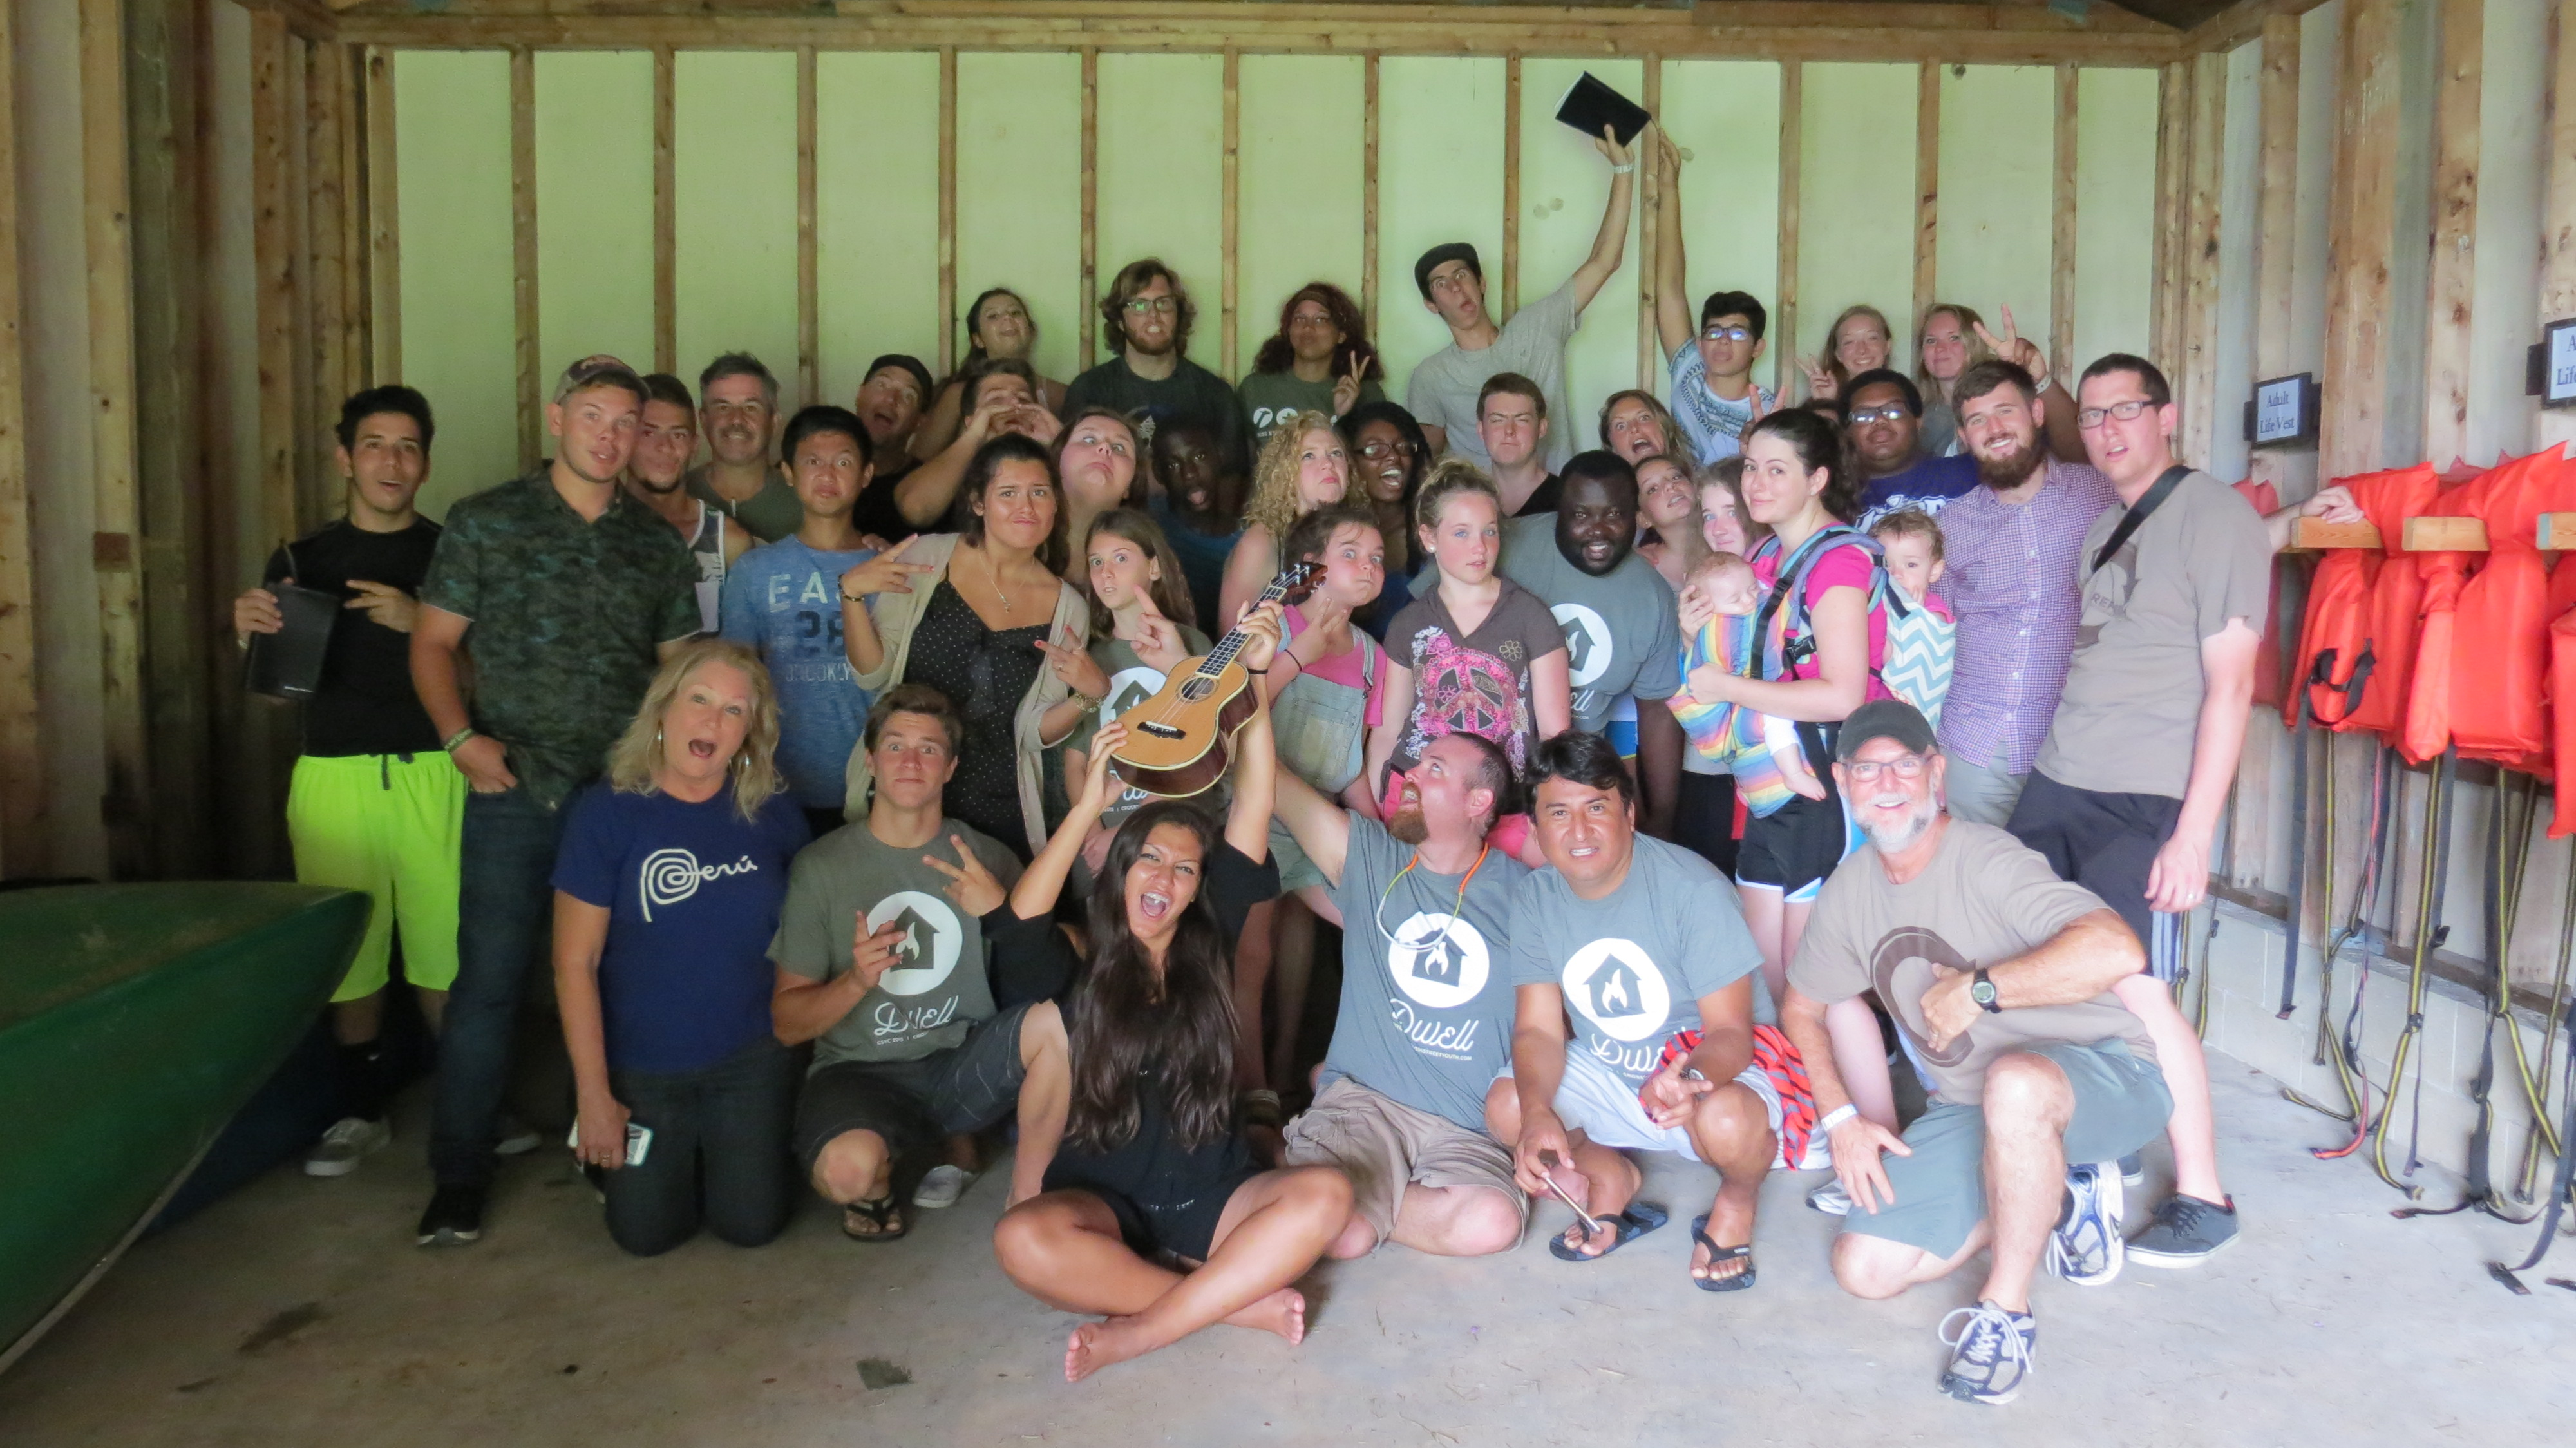 2015 DWELL Cross Street Youth Camp 385